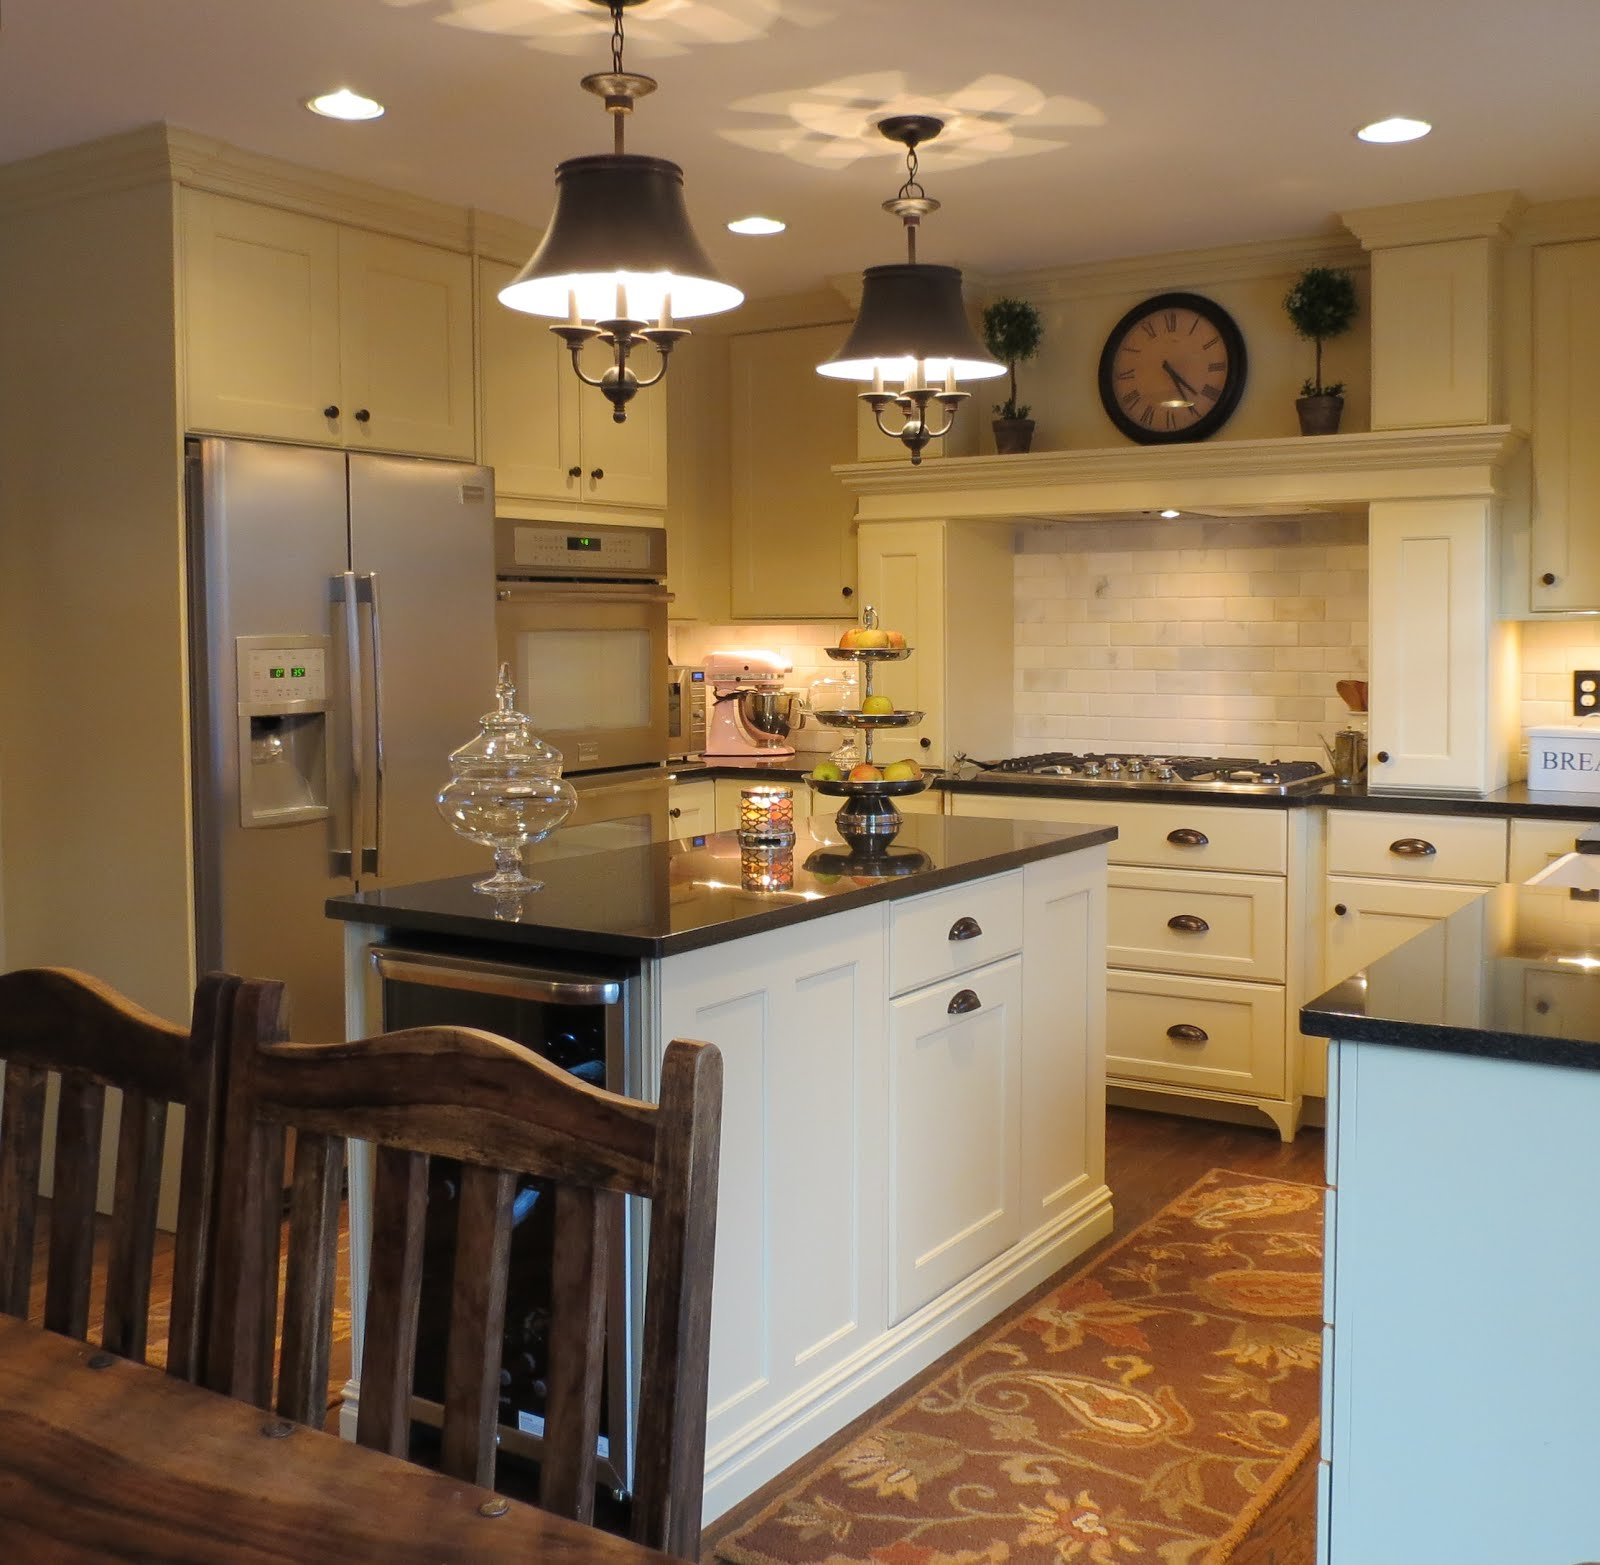 KC Cabinetry Design and Renovation: Highlands Ranch Remodel